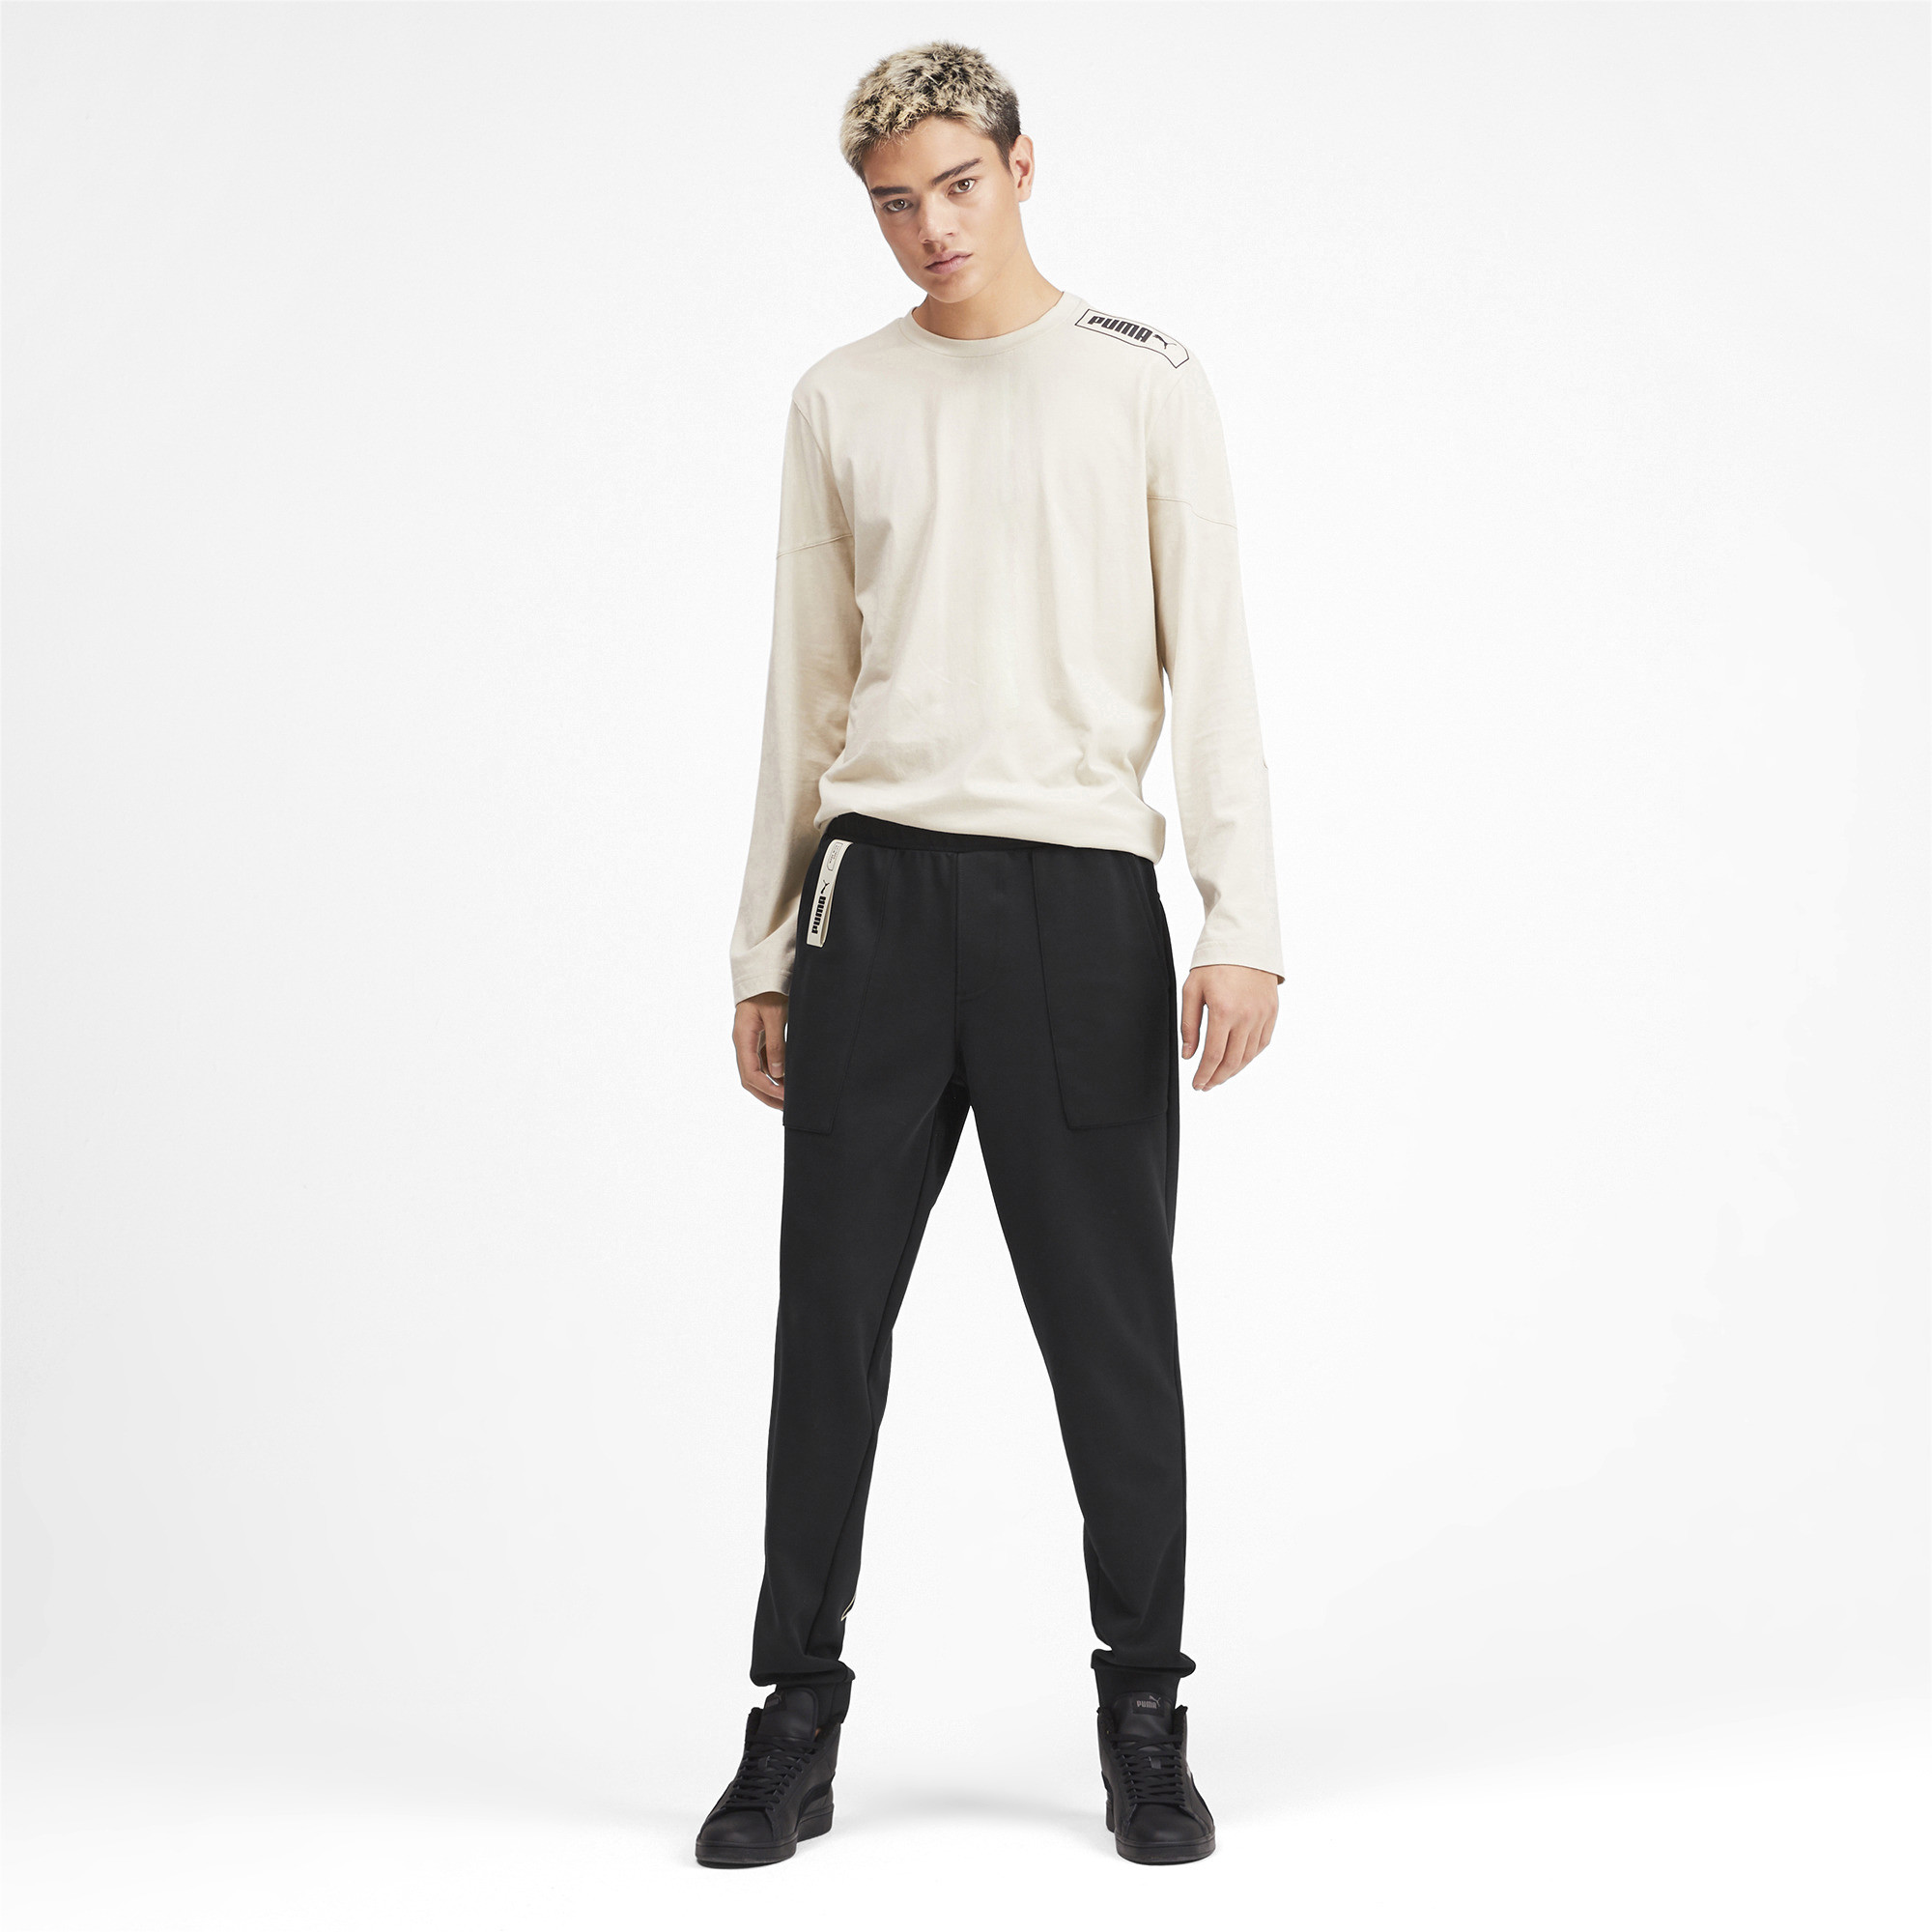 PUMA-NU-TILITY-Men-039-s-Sweatpants-Men-Knitted-Pants-Basics thumbnail 16